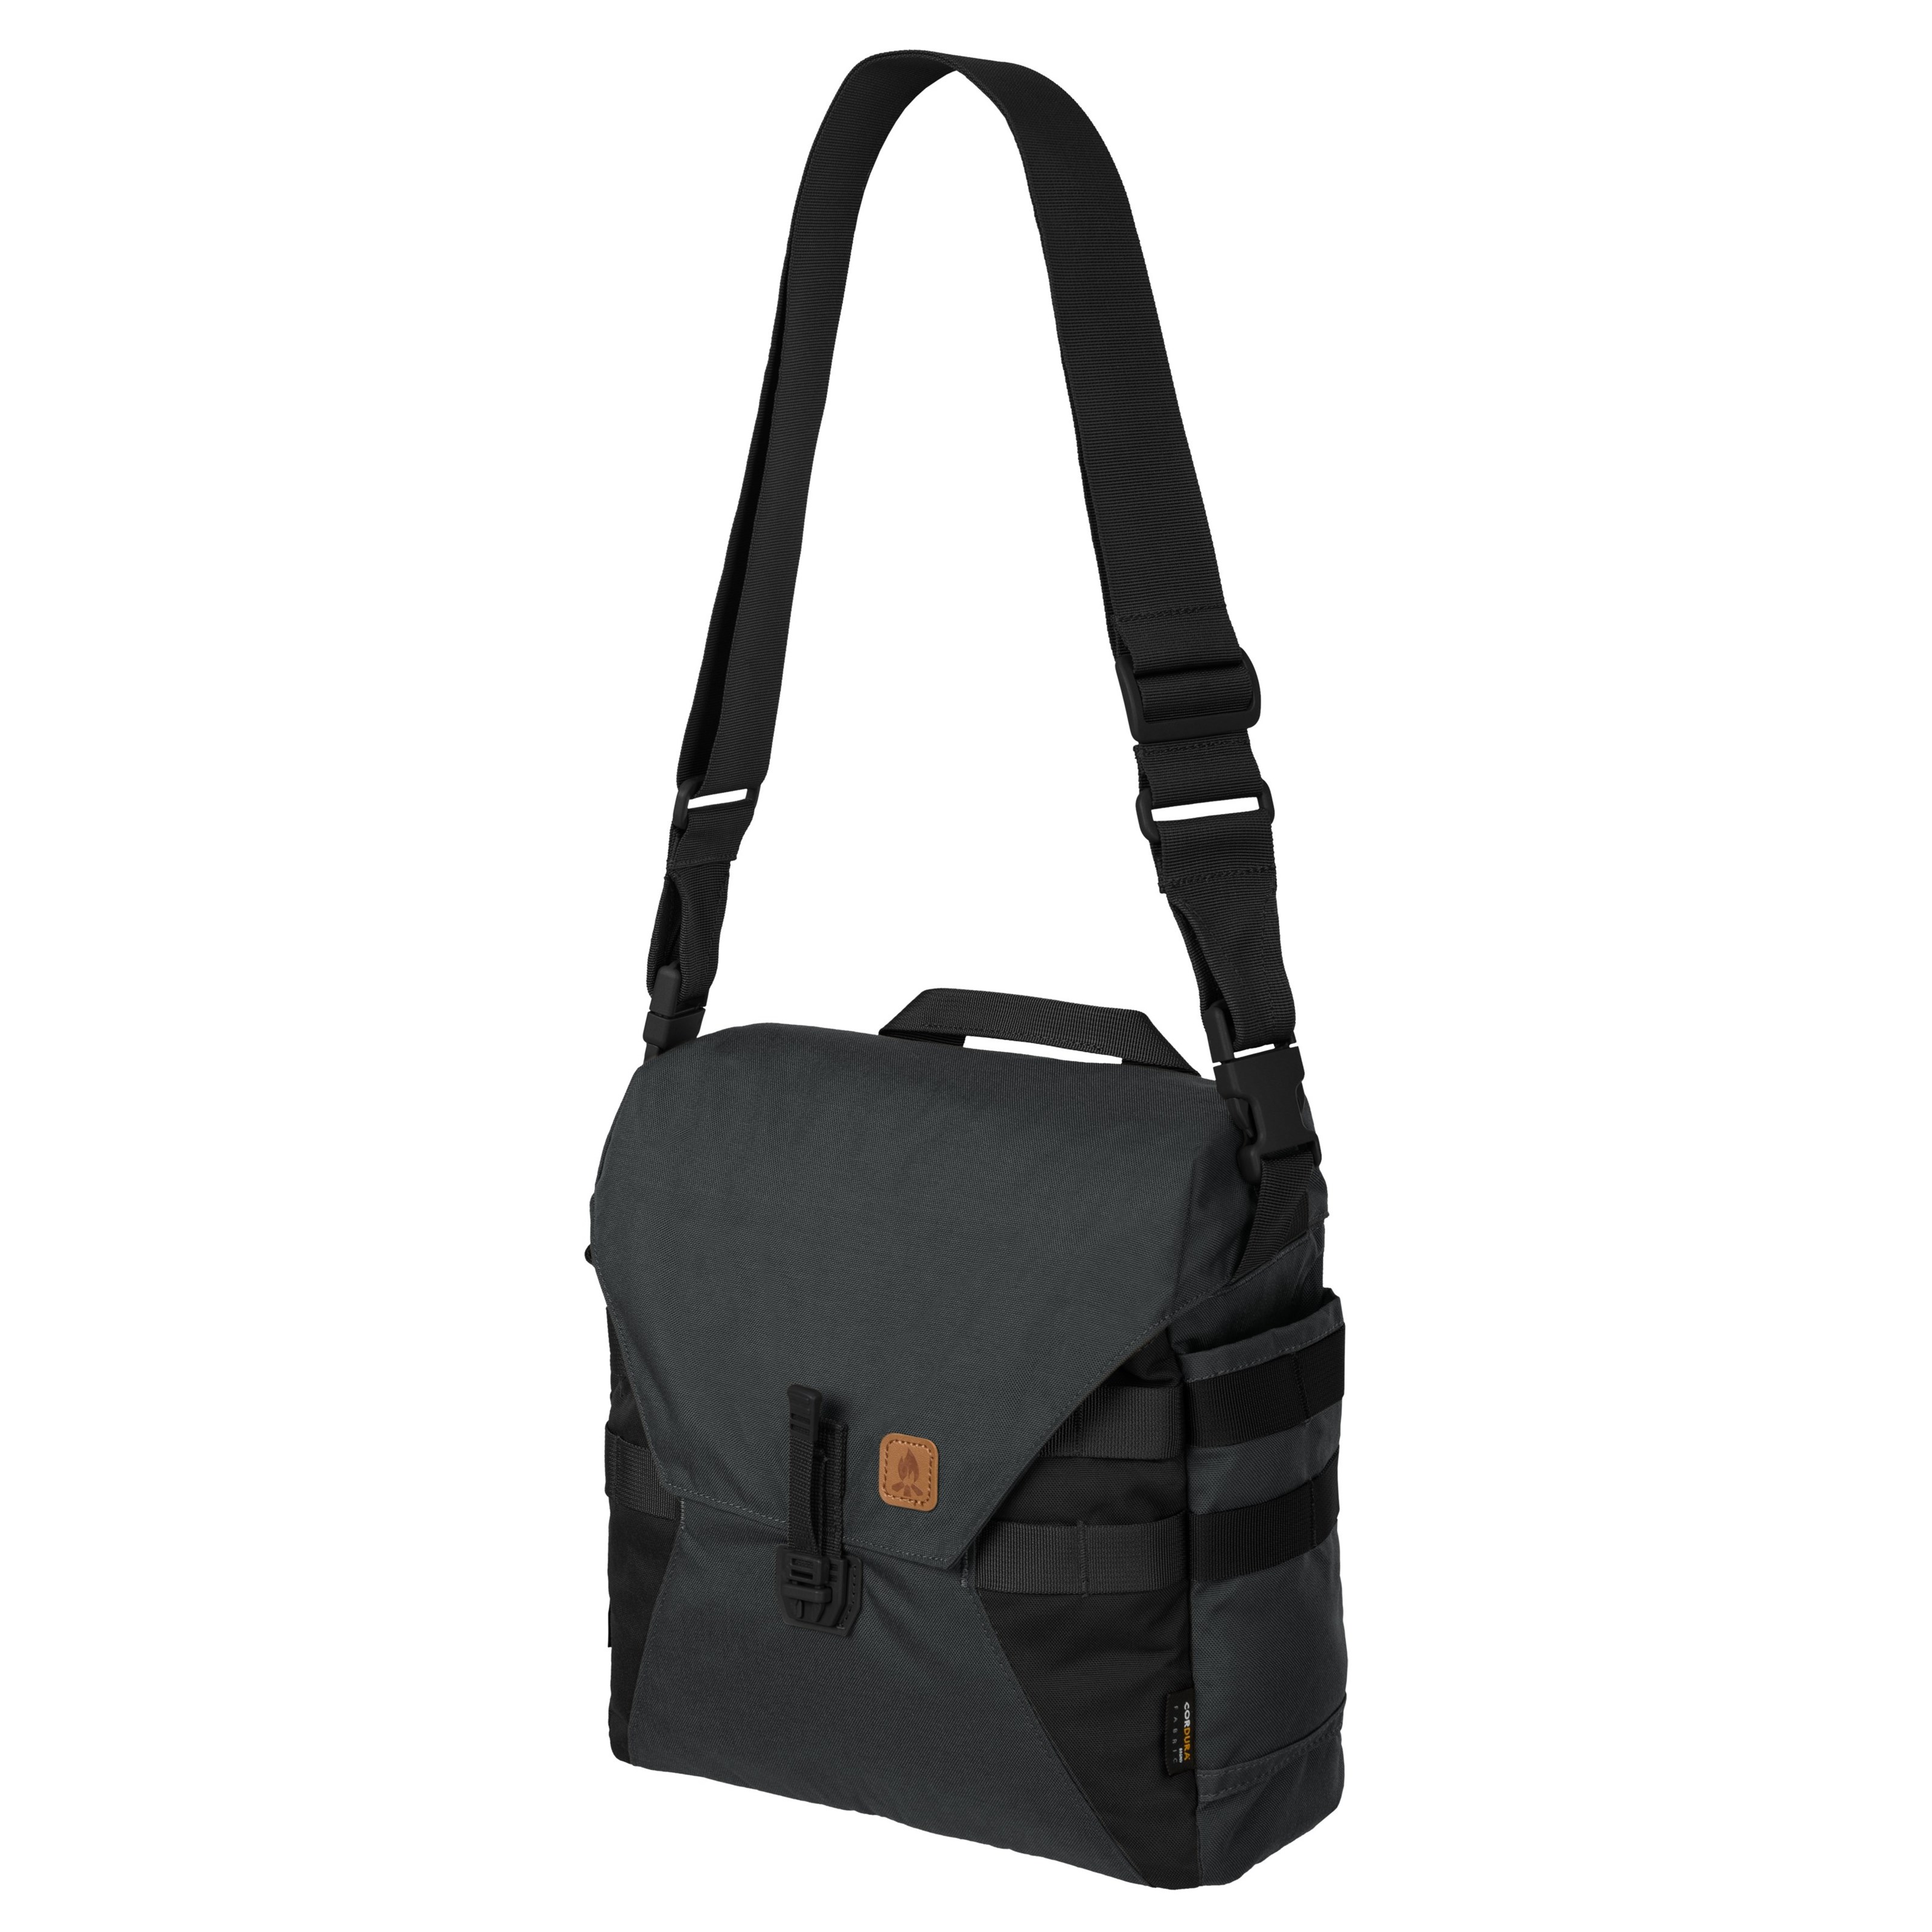 BUSHCRAFT HAVERSACK BAG SHADOW GREY/BLACK Helikon-Tex® TB-HVS-CD-3501B L-11